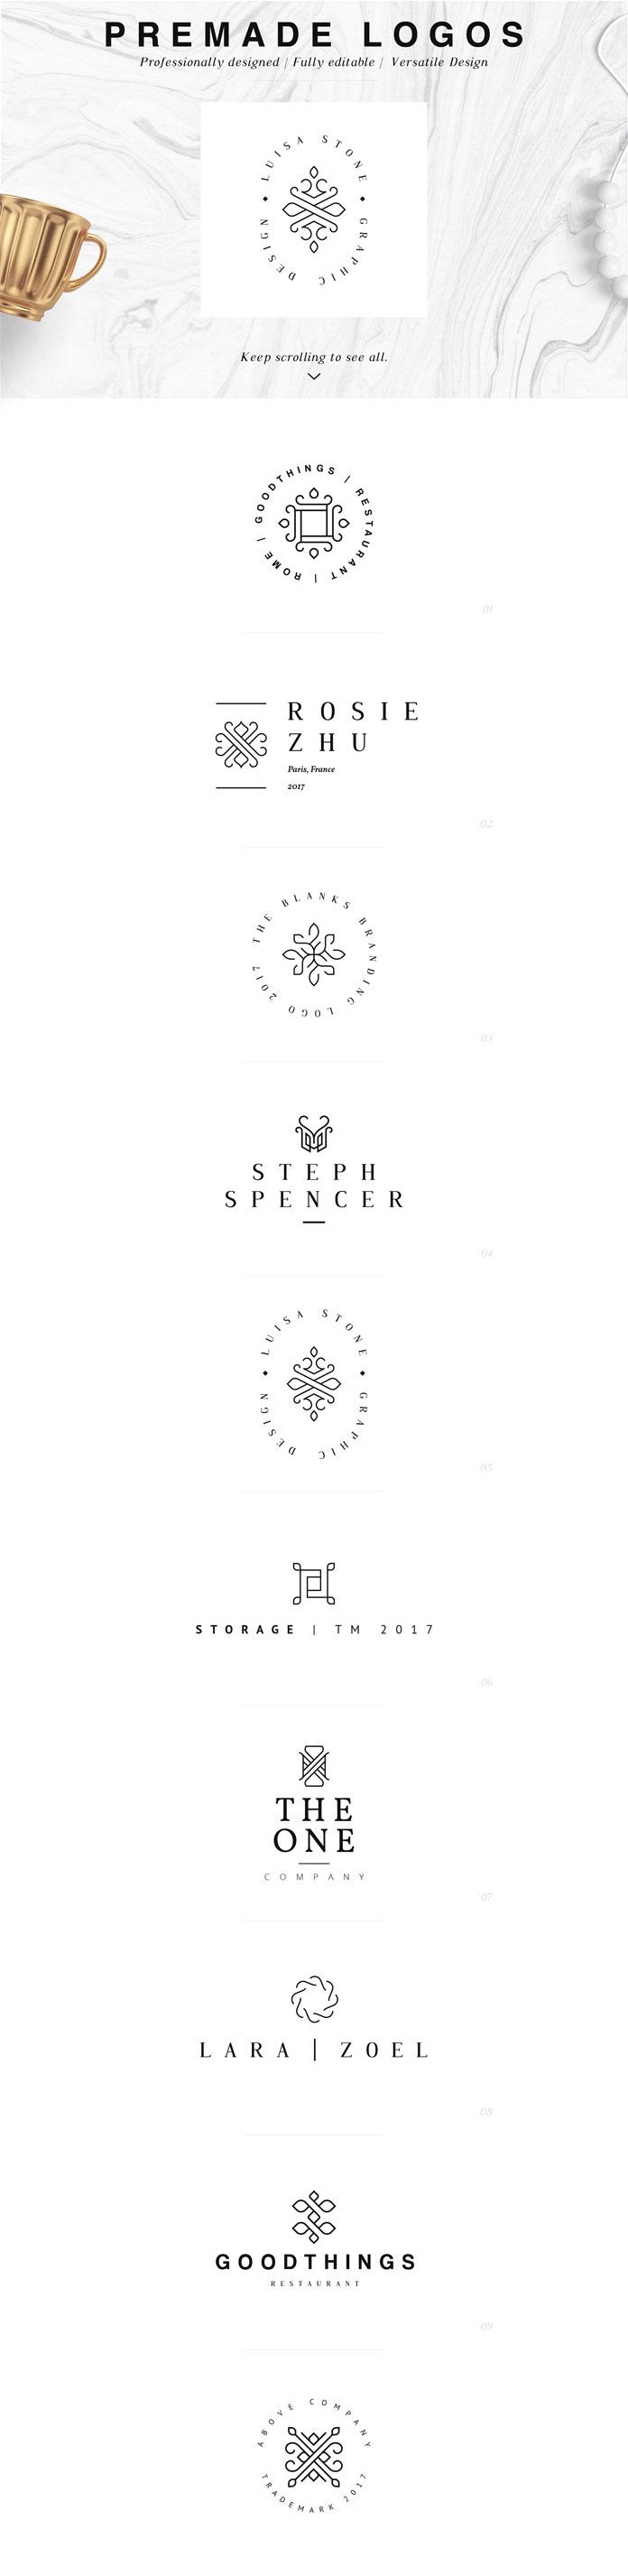 Pre-made logos.